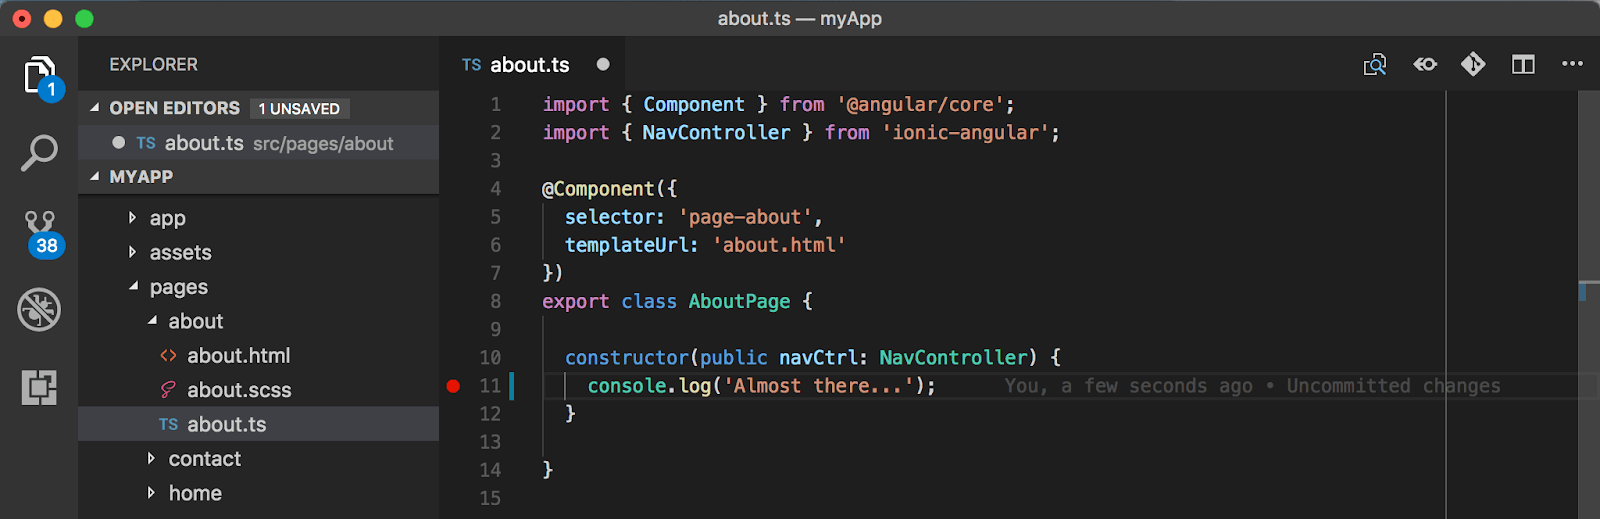 ionic-cordova-debug-device-visual-studio-code-execute